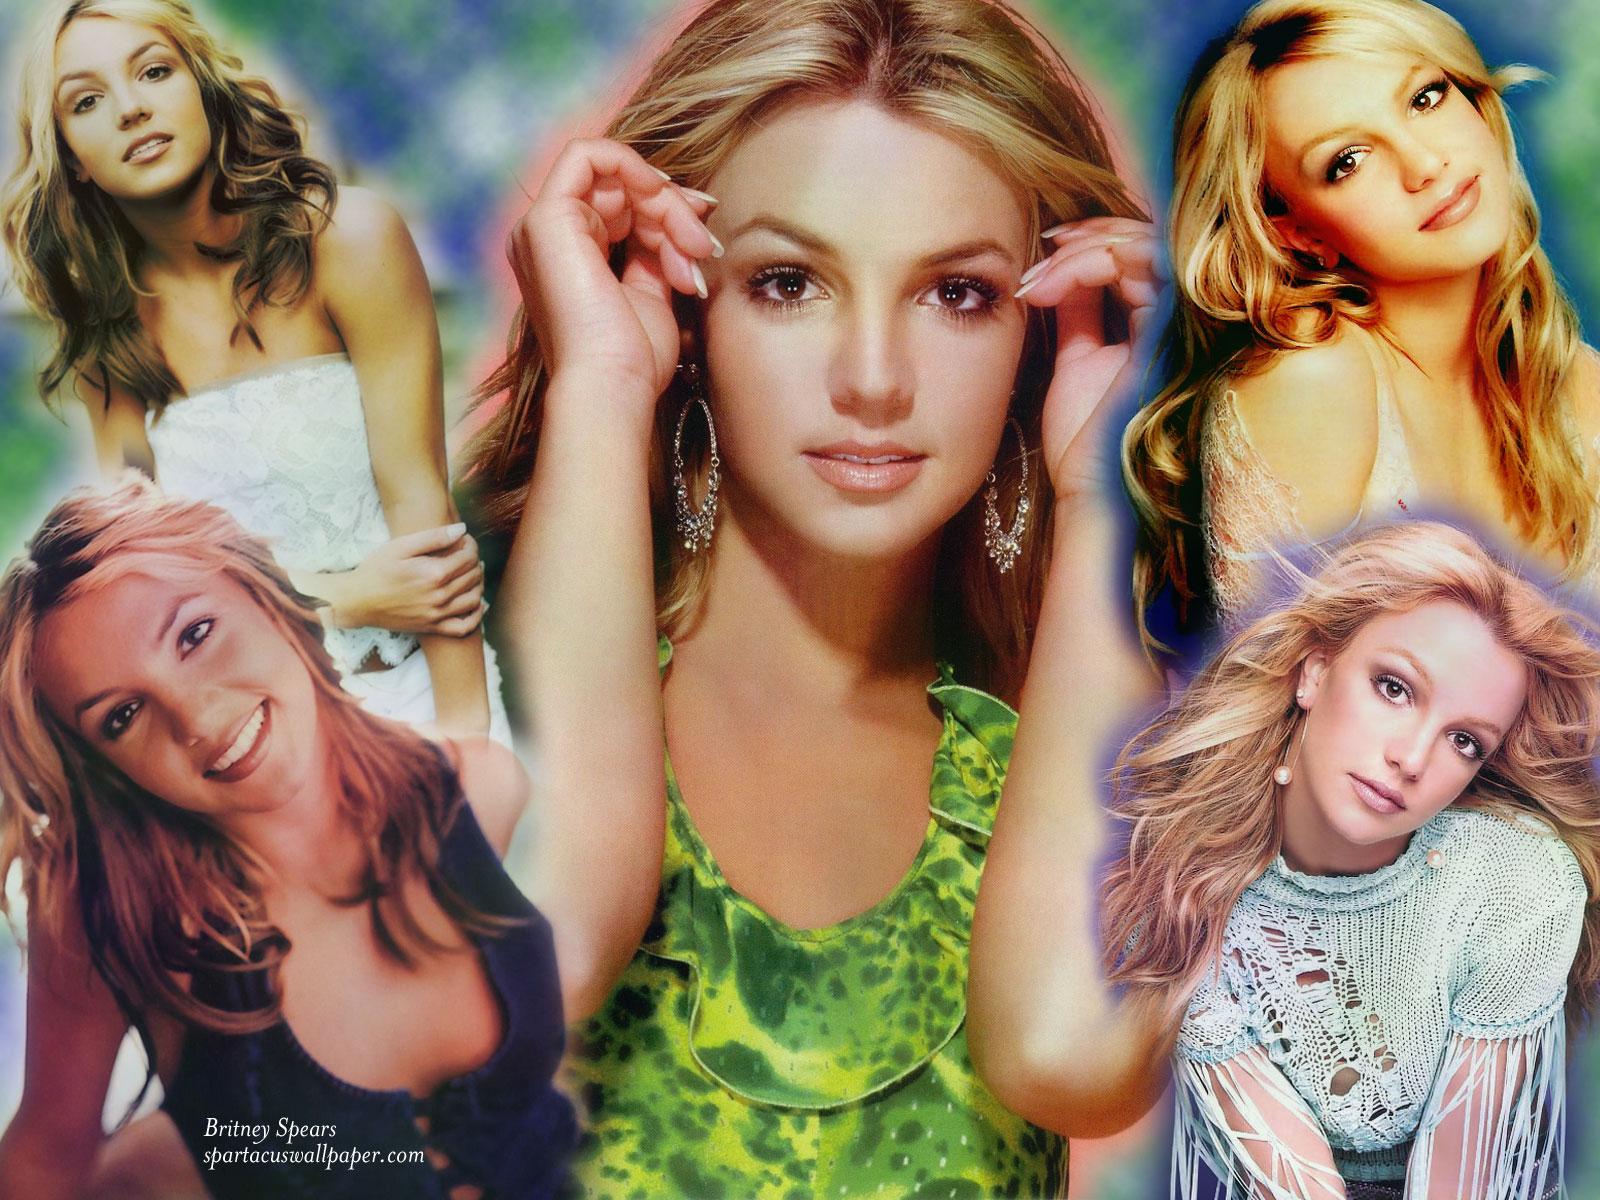 Britney Spears Xvii Desktop Backgrounds Mobile Home Screens Spartacus Wallpaper